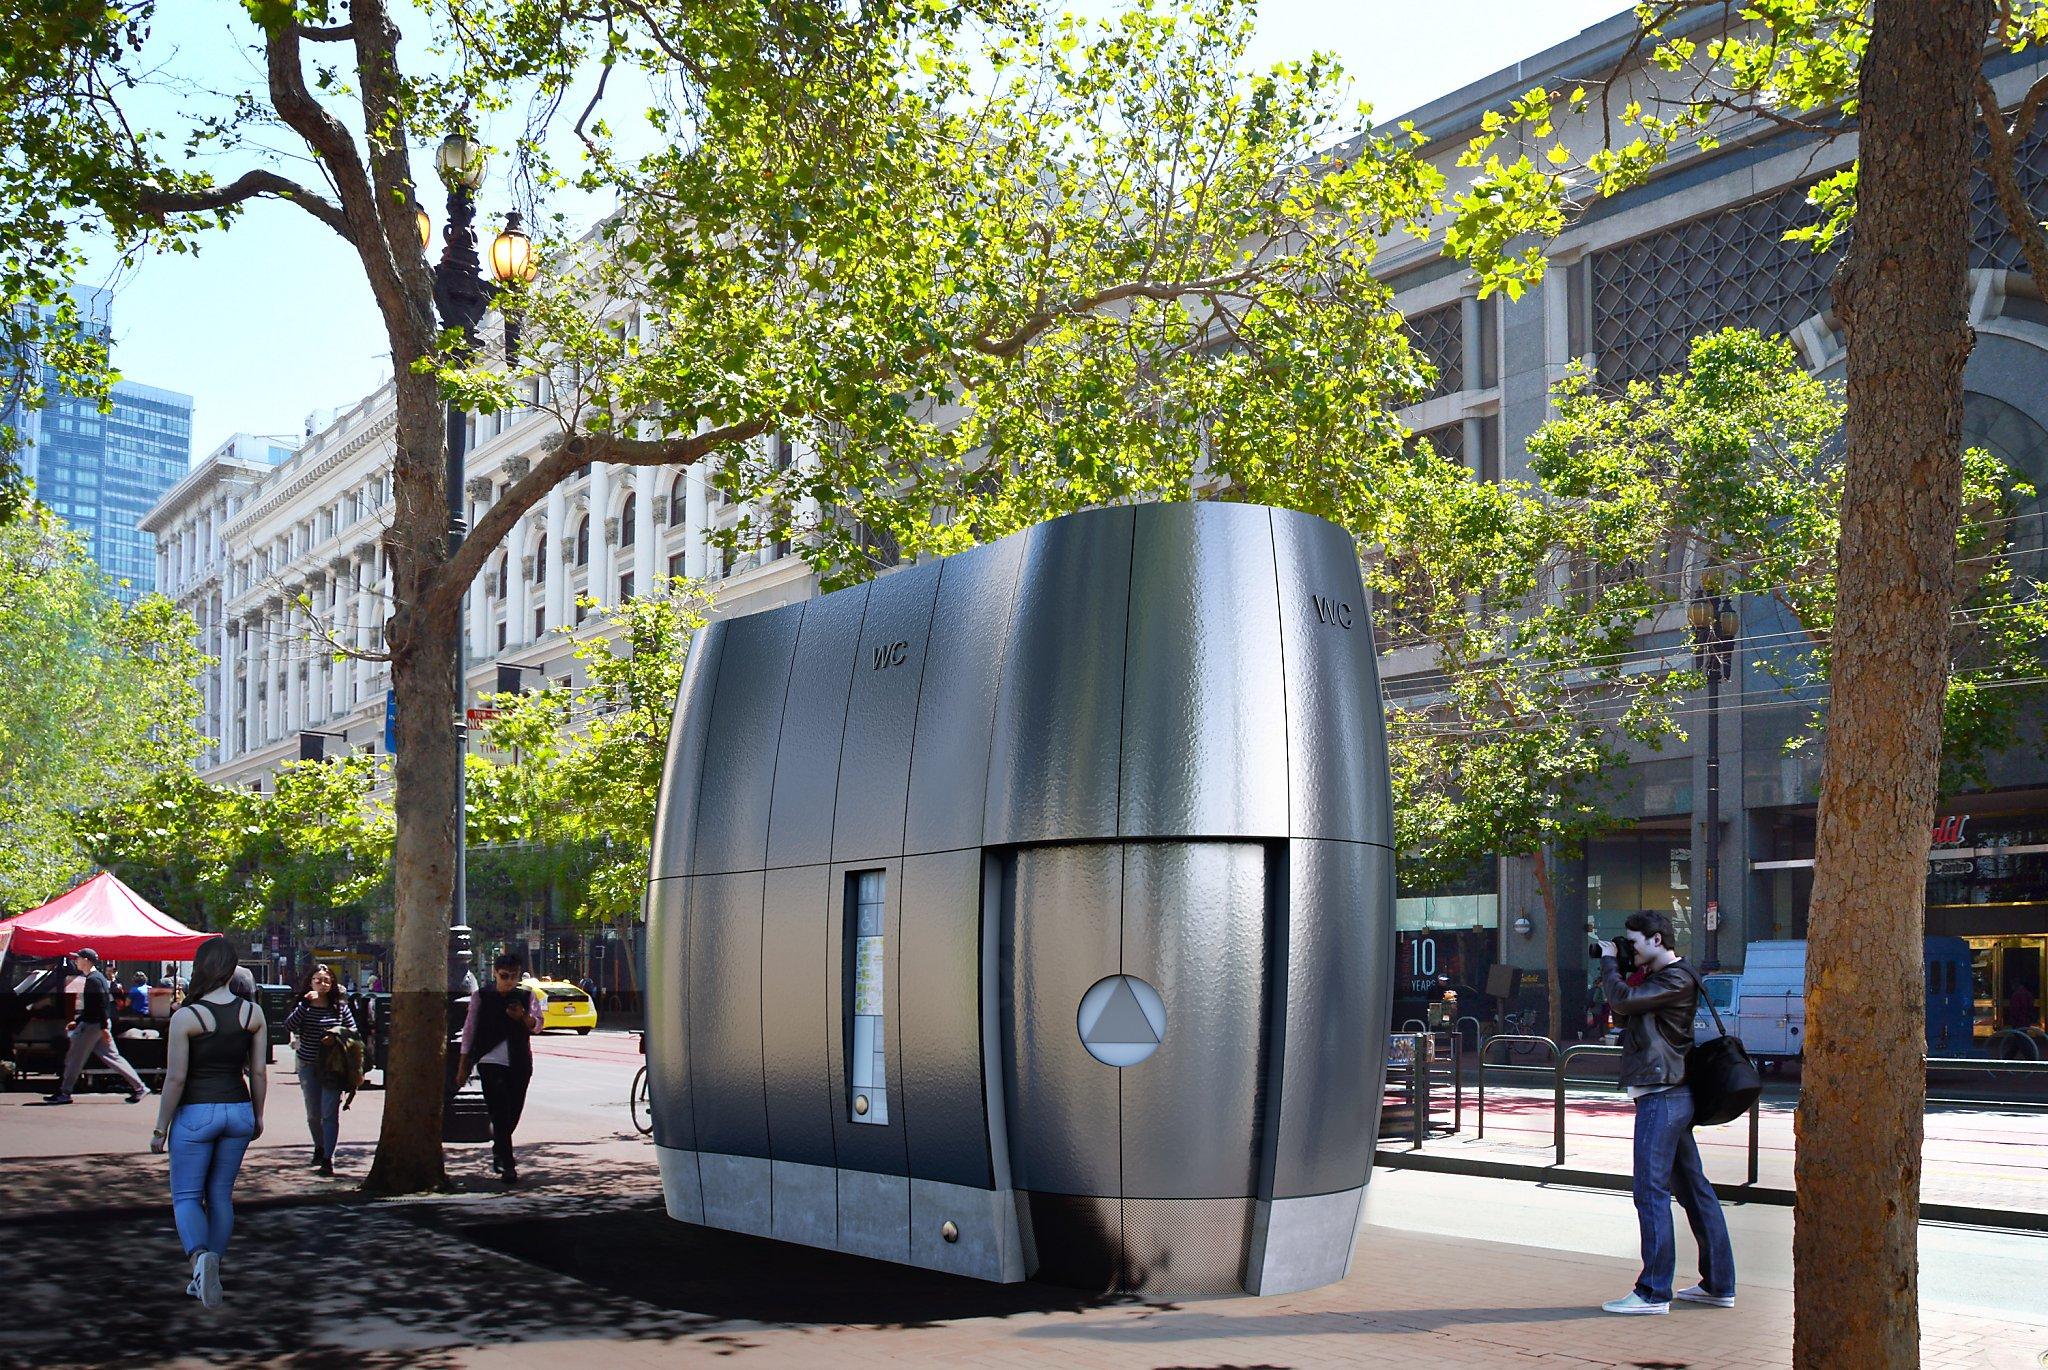 SF's Historic Preservation Commission OKs sleek design for new street toilets